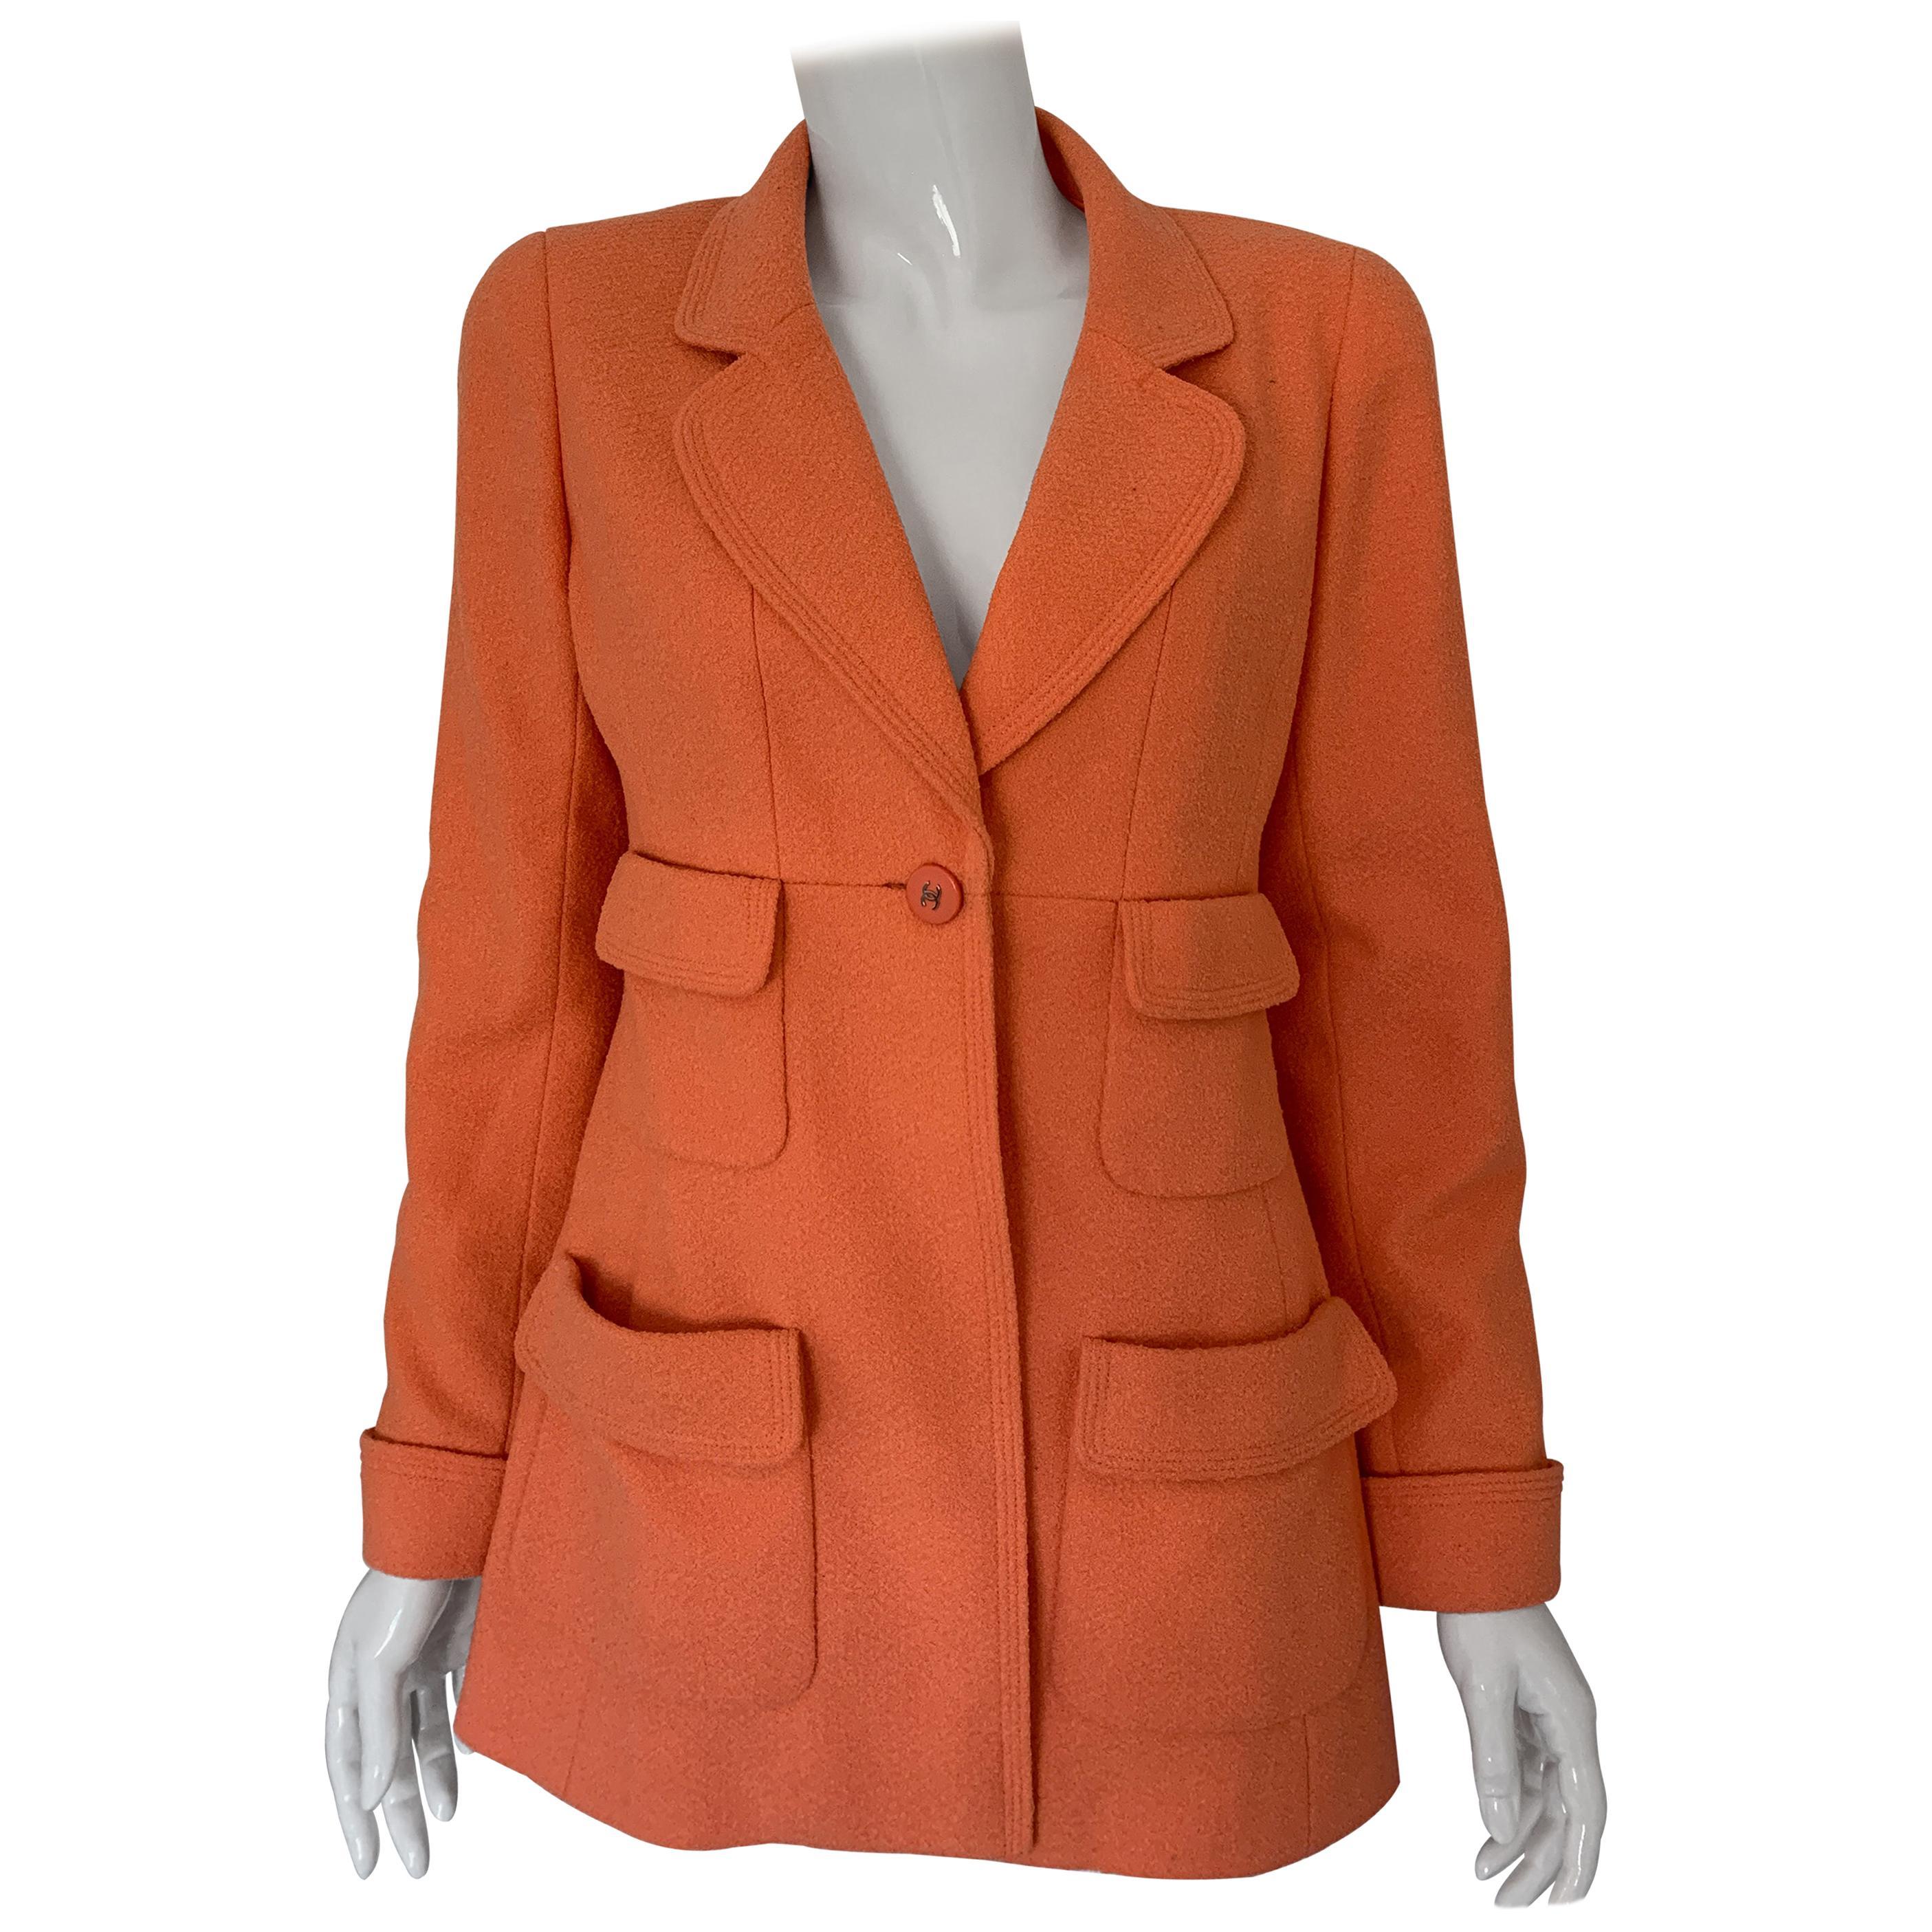 Chanel Vintage 1992 Single Breasted Coral Jacket